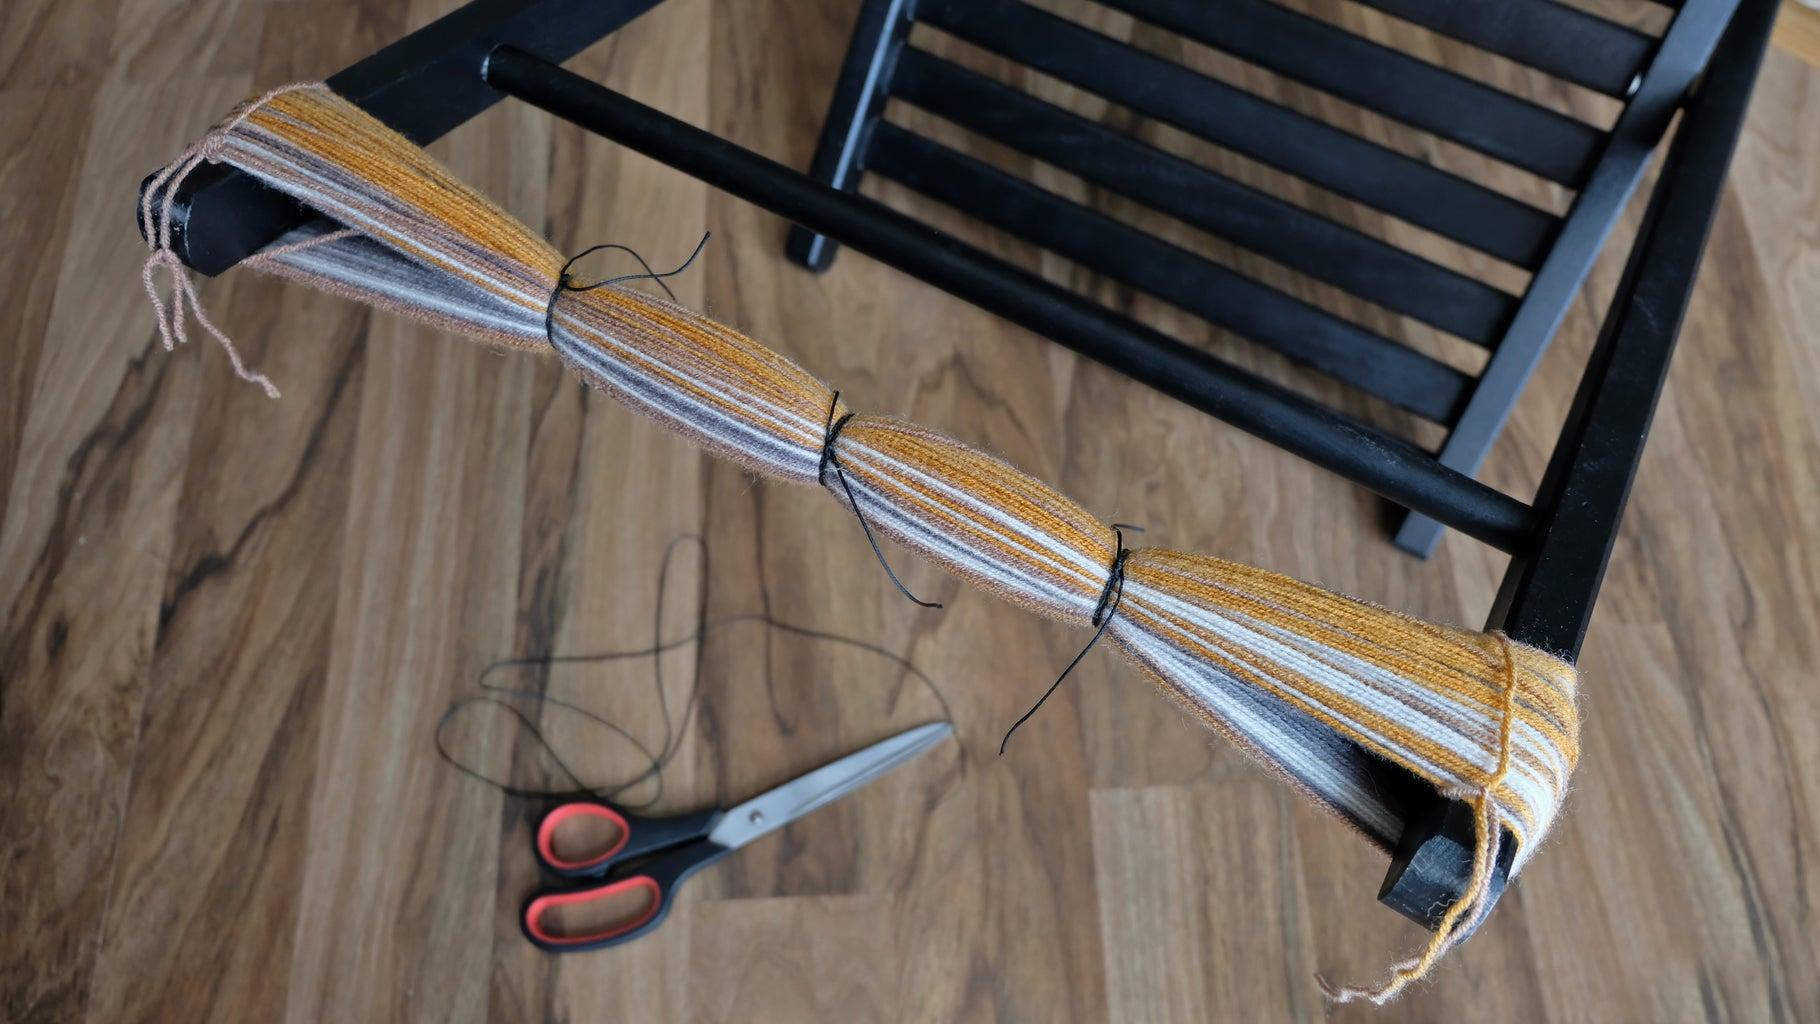 Making Pompoms. Binding